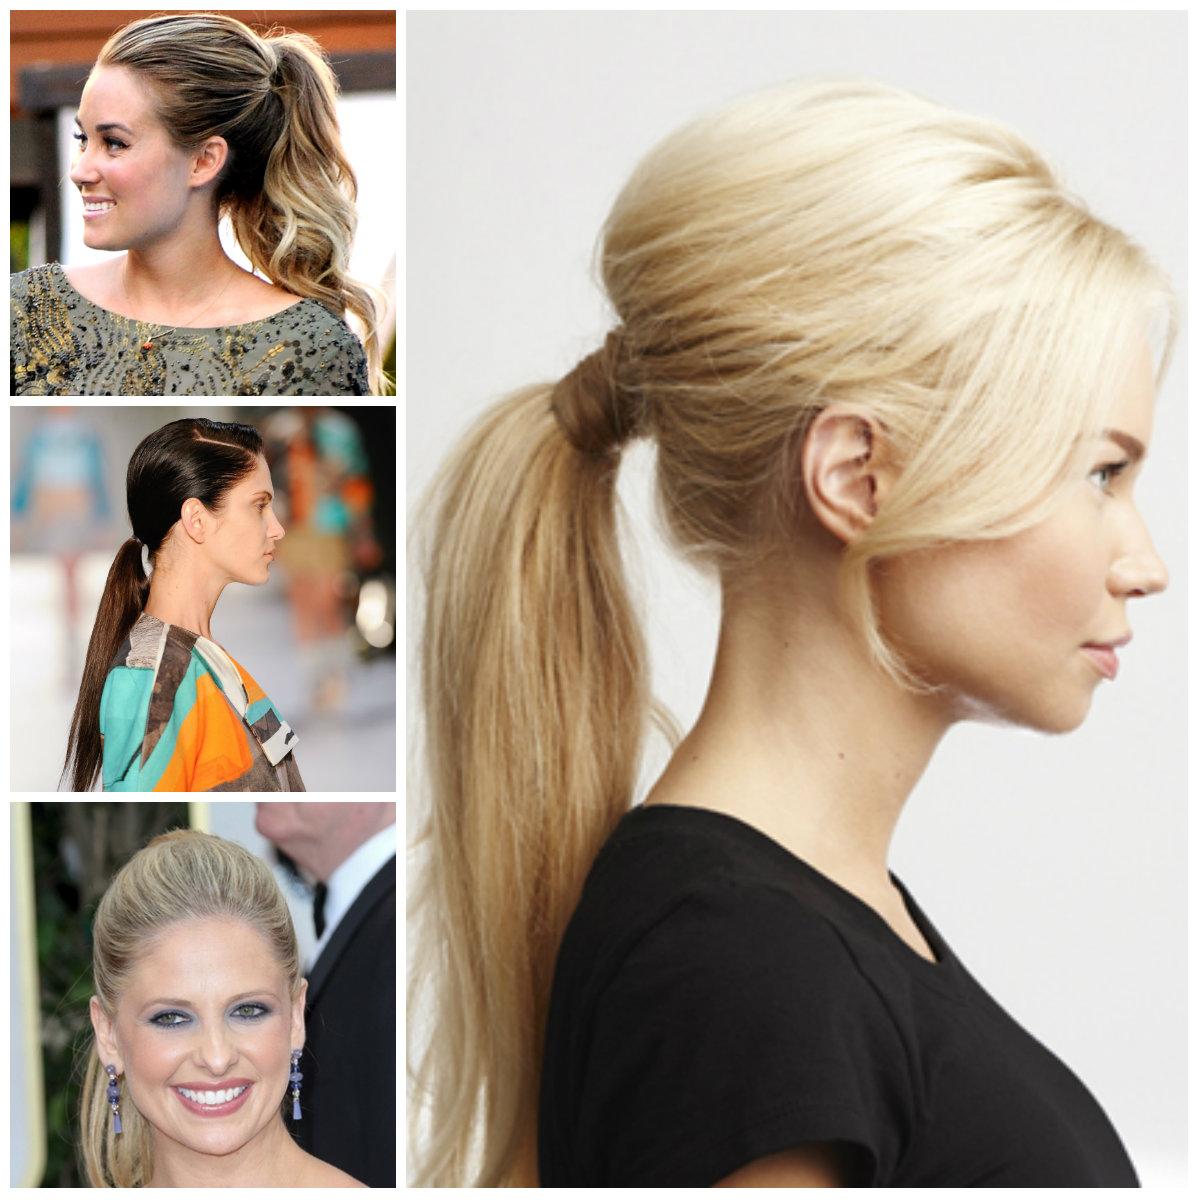 FemalesE28099-Formal-Ponytail-Hairstyles-